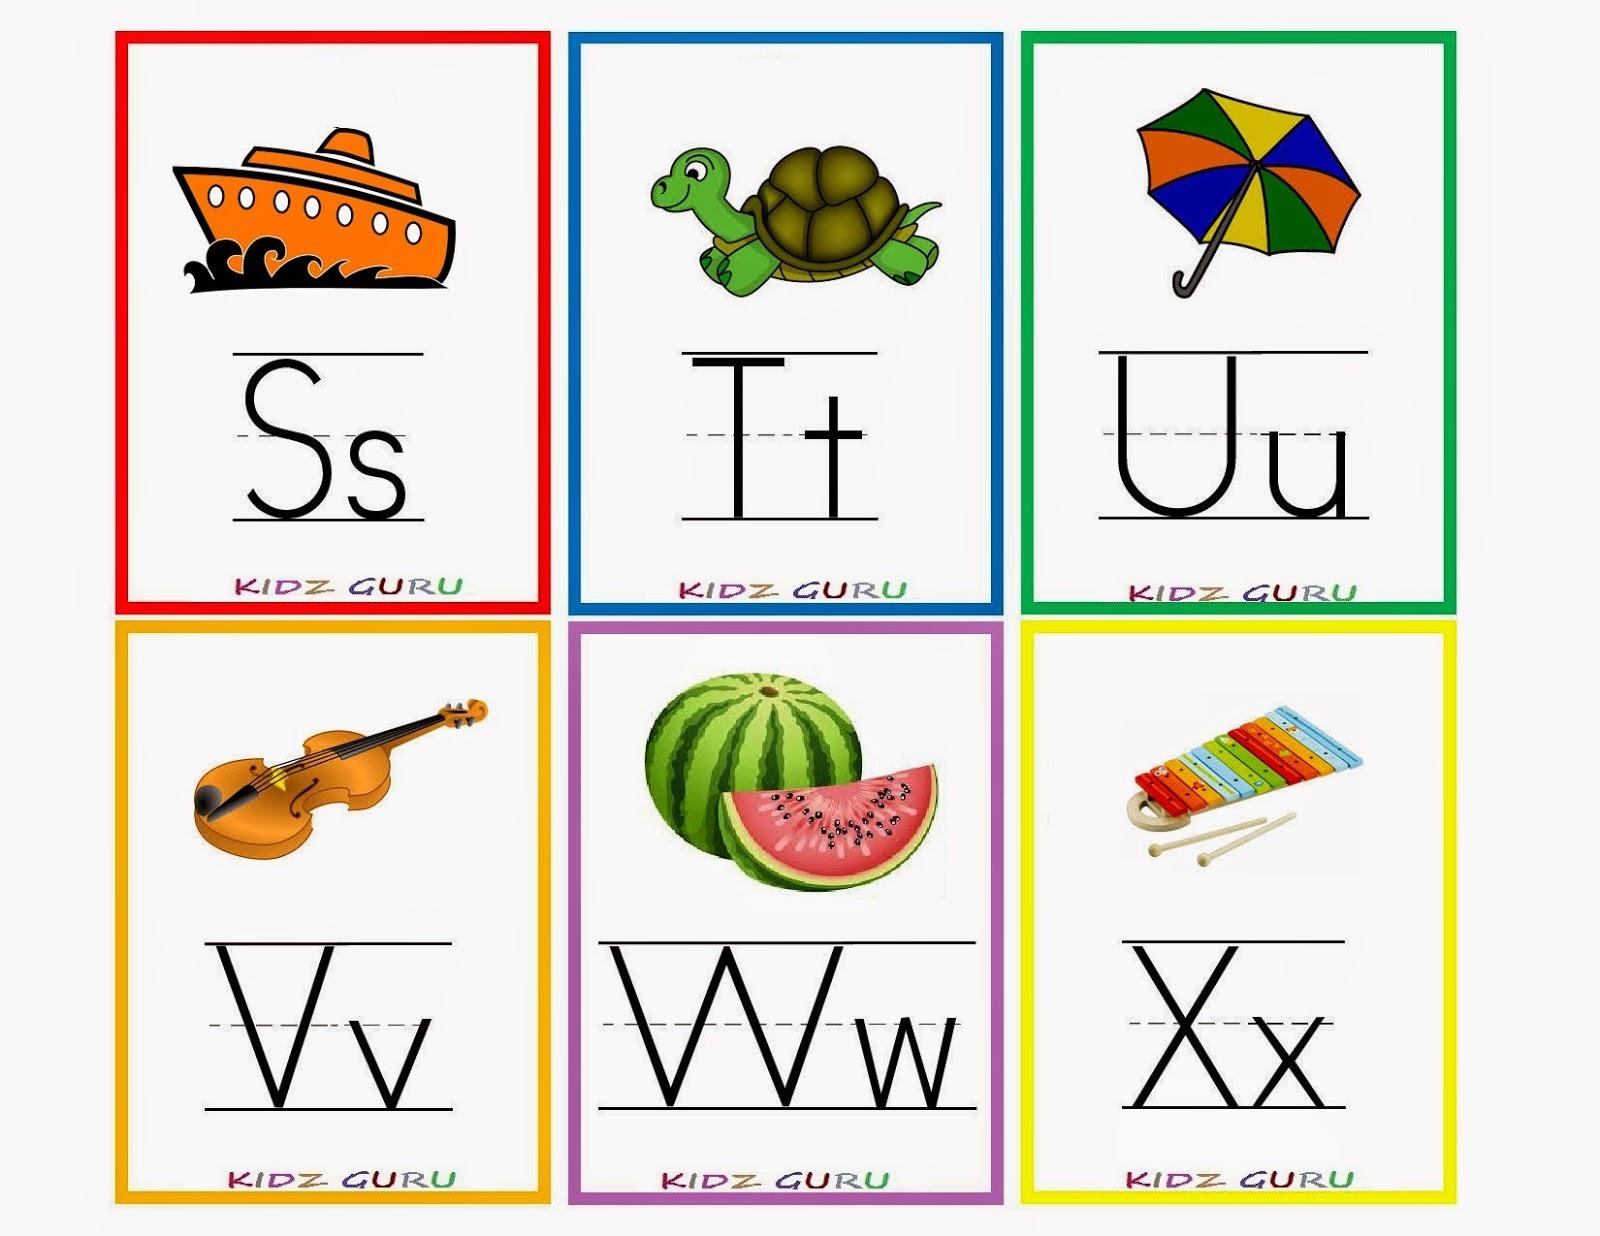 Kindergarten Worksheets: Printable Worksheets - Alphabet Flash Cards 4 - Abc Flash Cards Free Printable